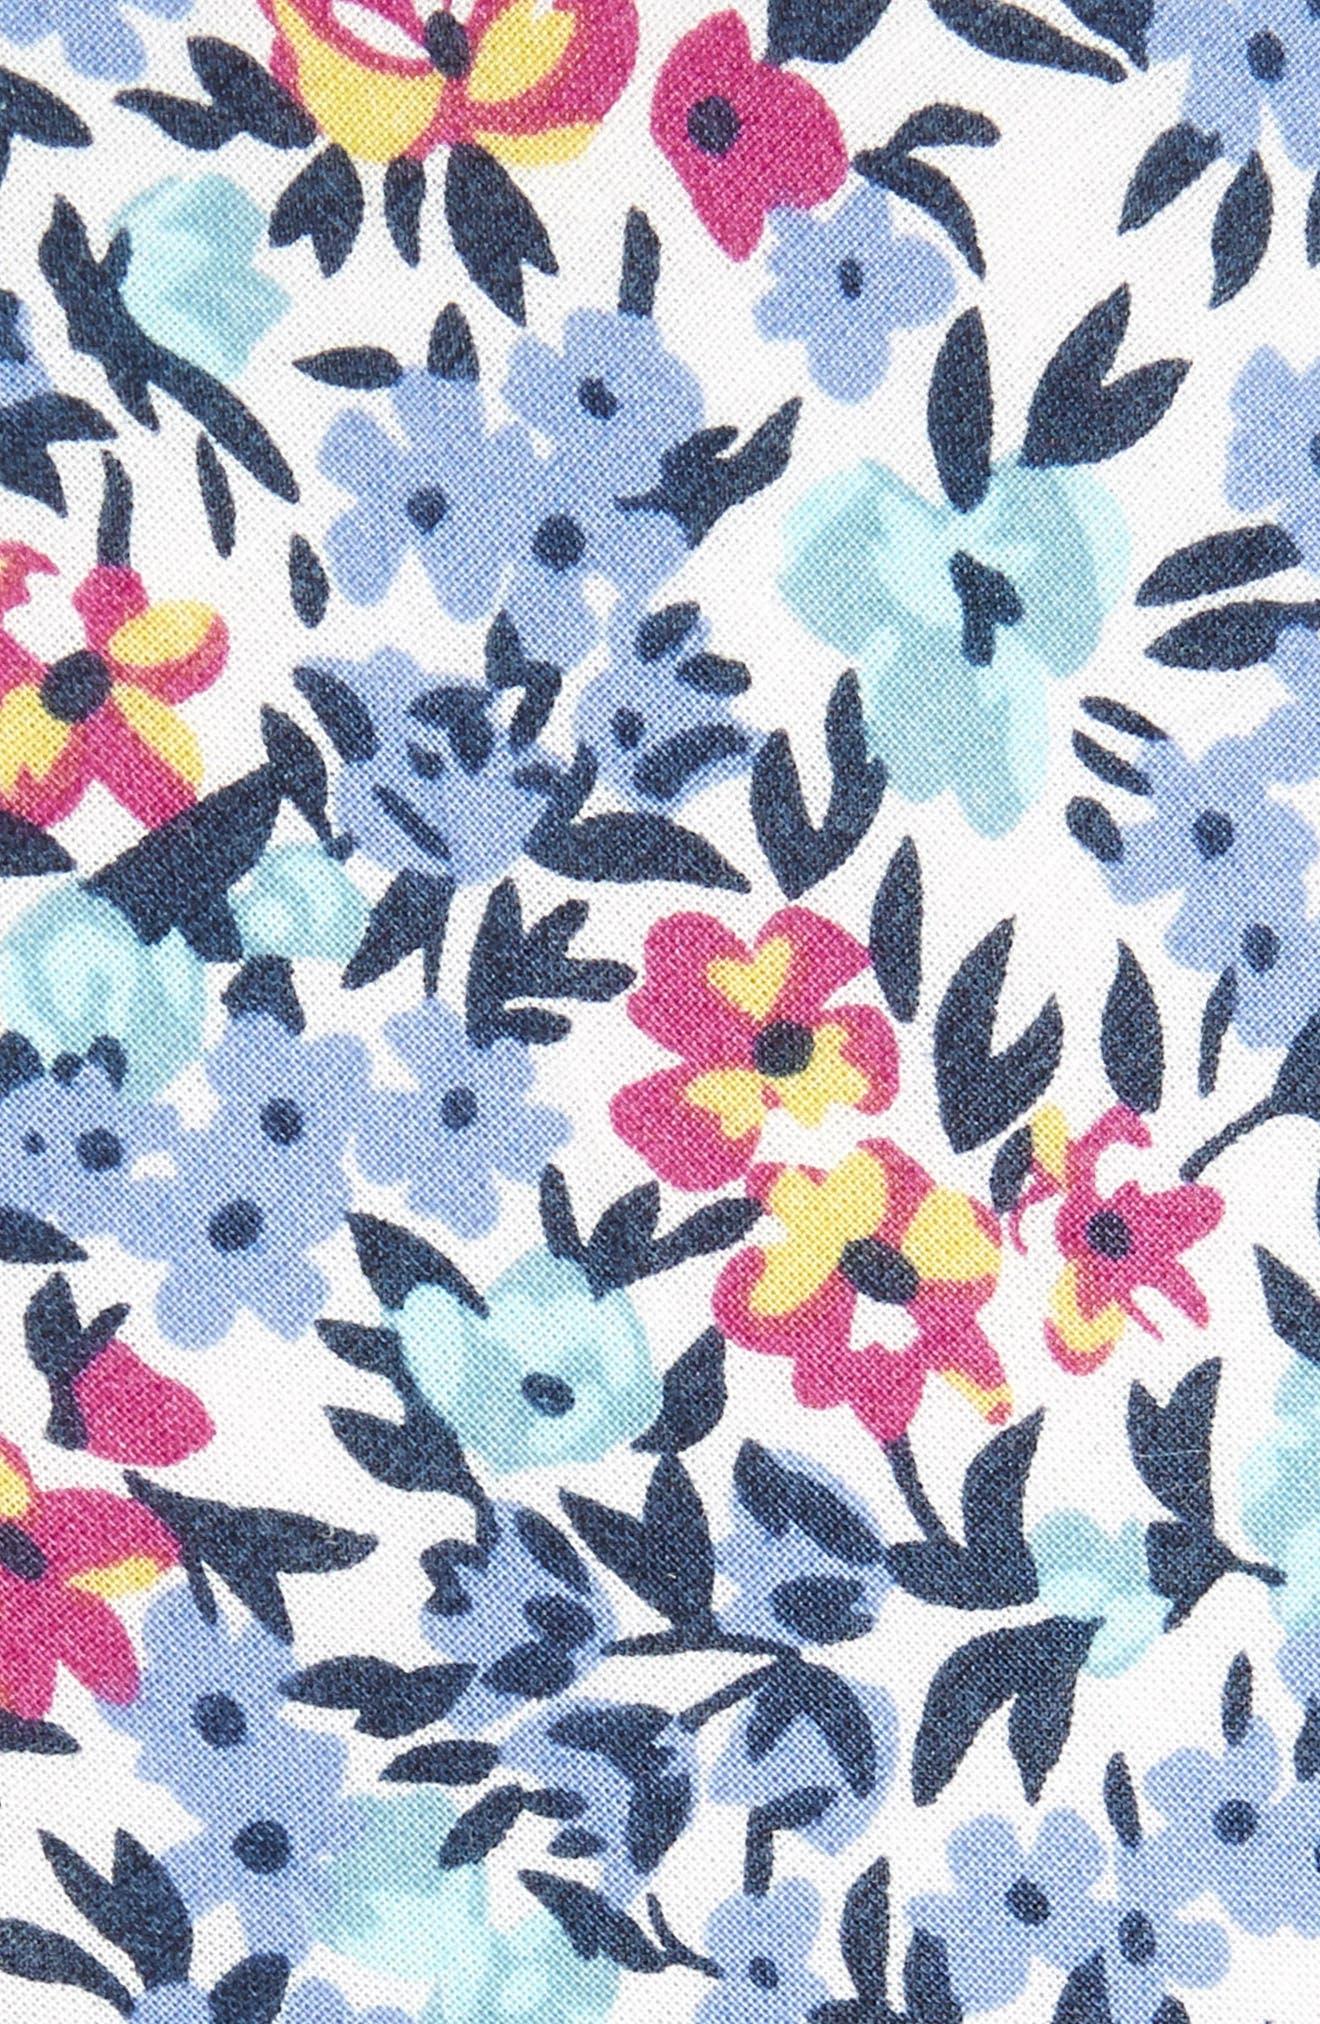 Anvil Floral Cotton Skinny Tie,                             Alternate thumbnail 2, color,                             400